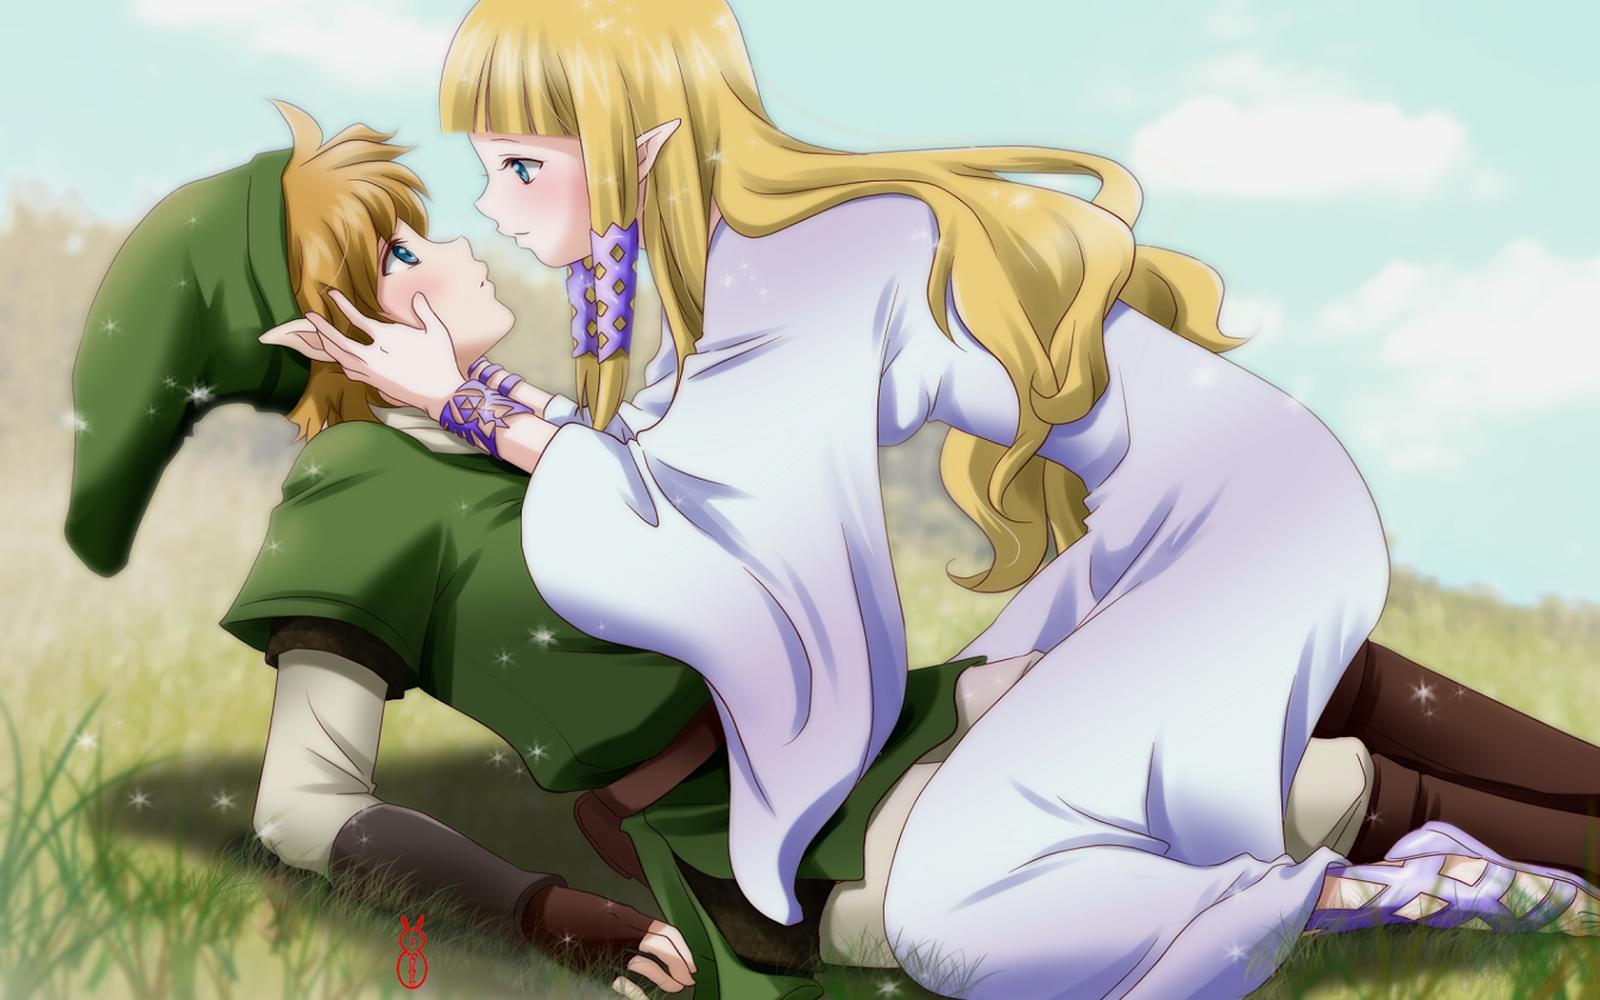 Cute Anime Loving Couple HD Wallpaper Best Love Wallpapers 1600x1000